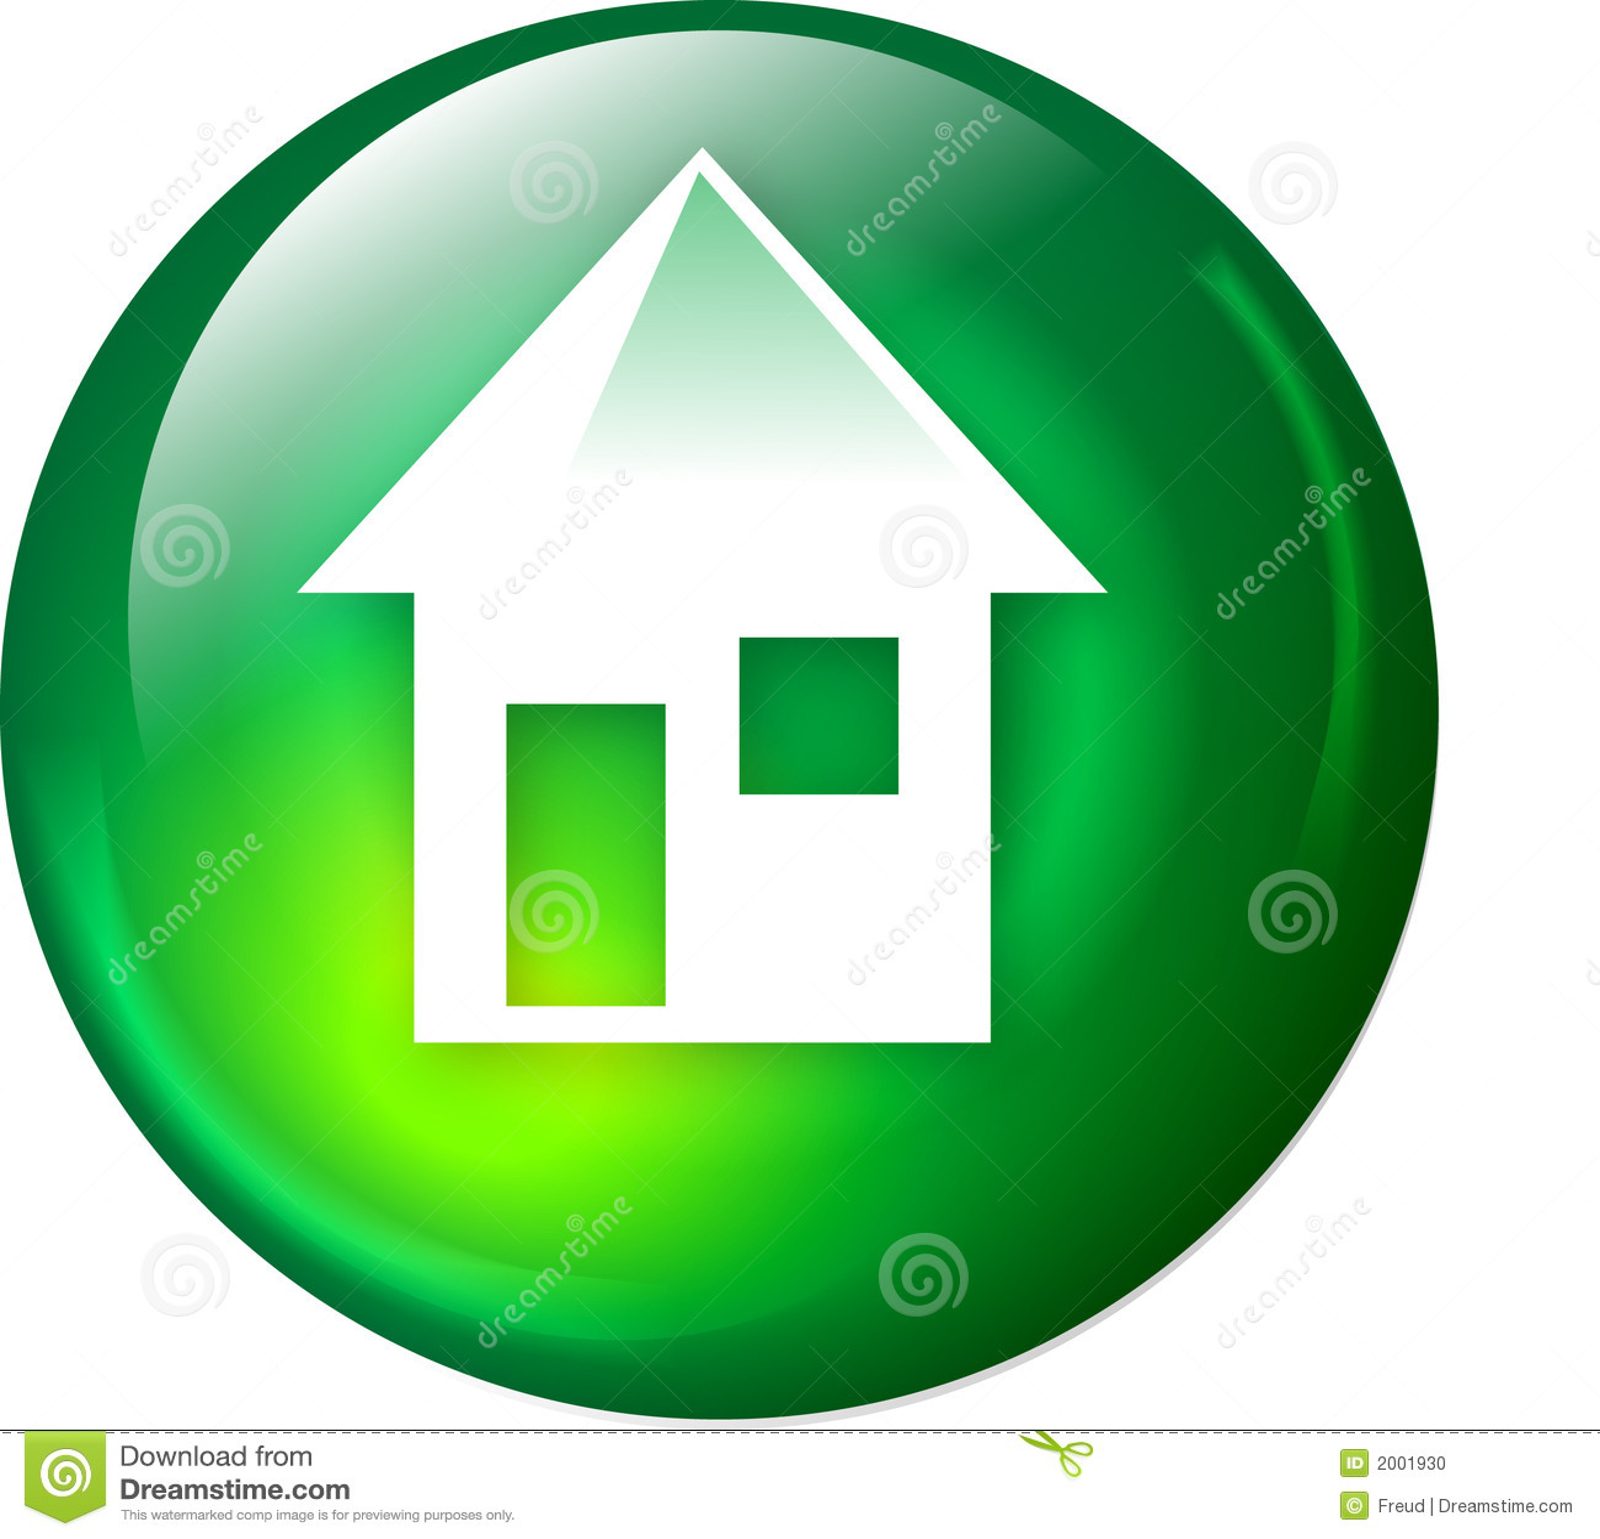 Home Web Button Stock Photo